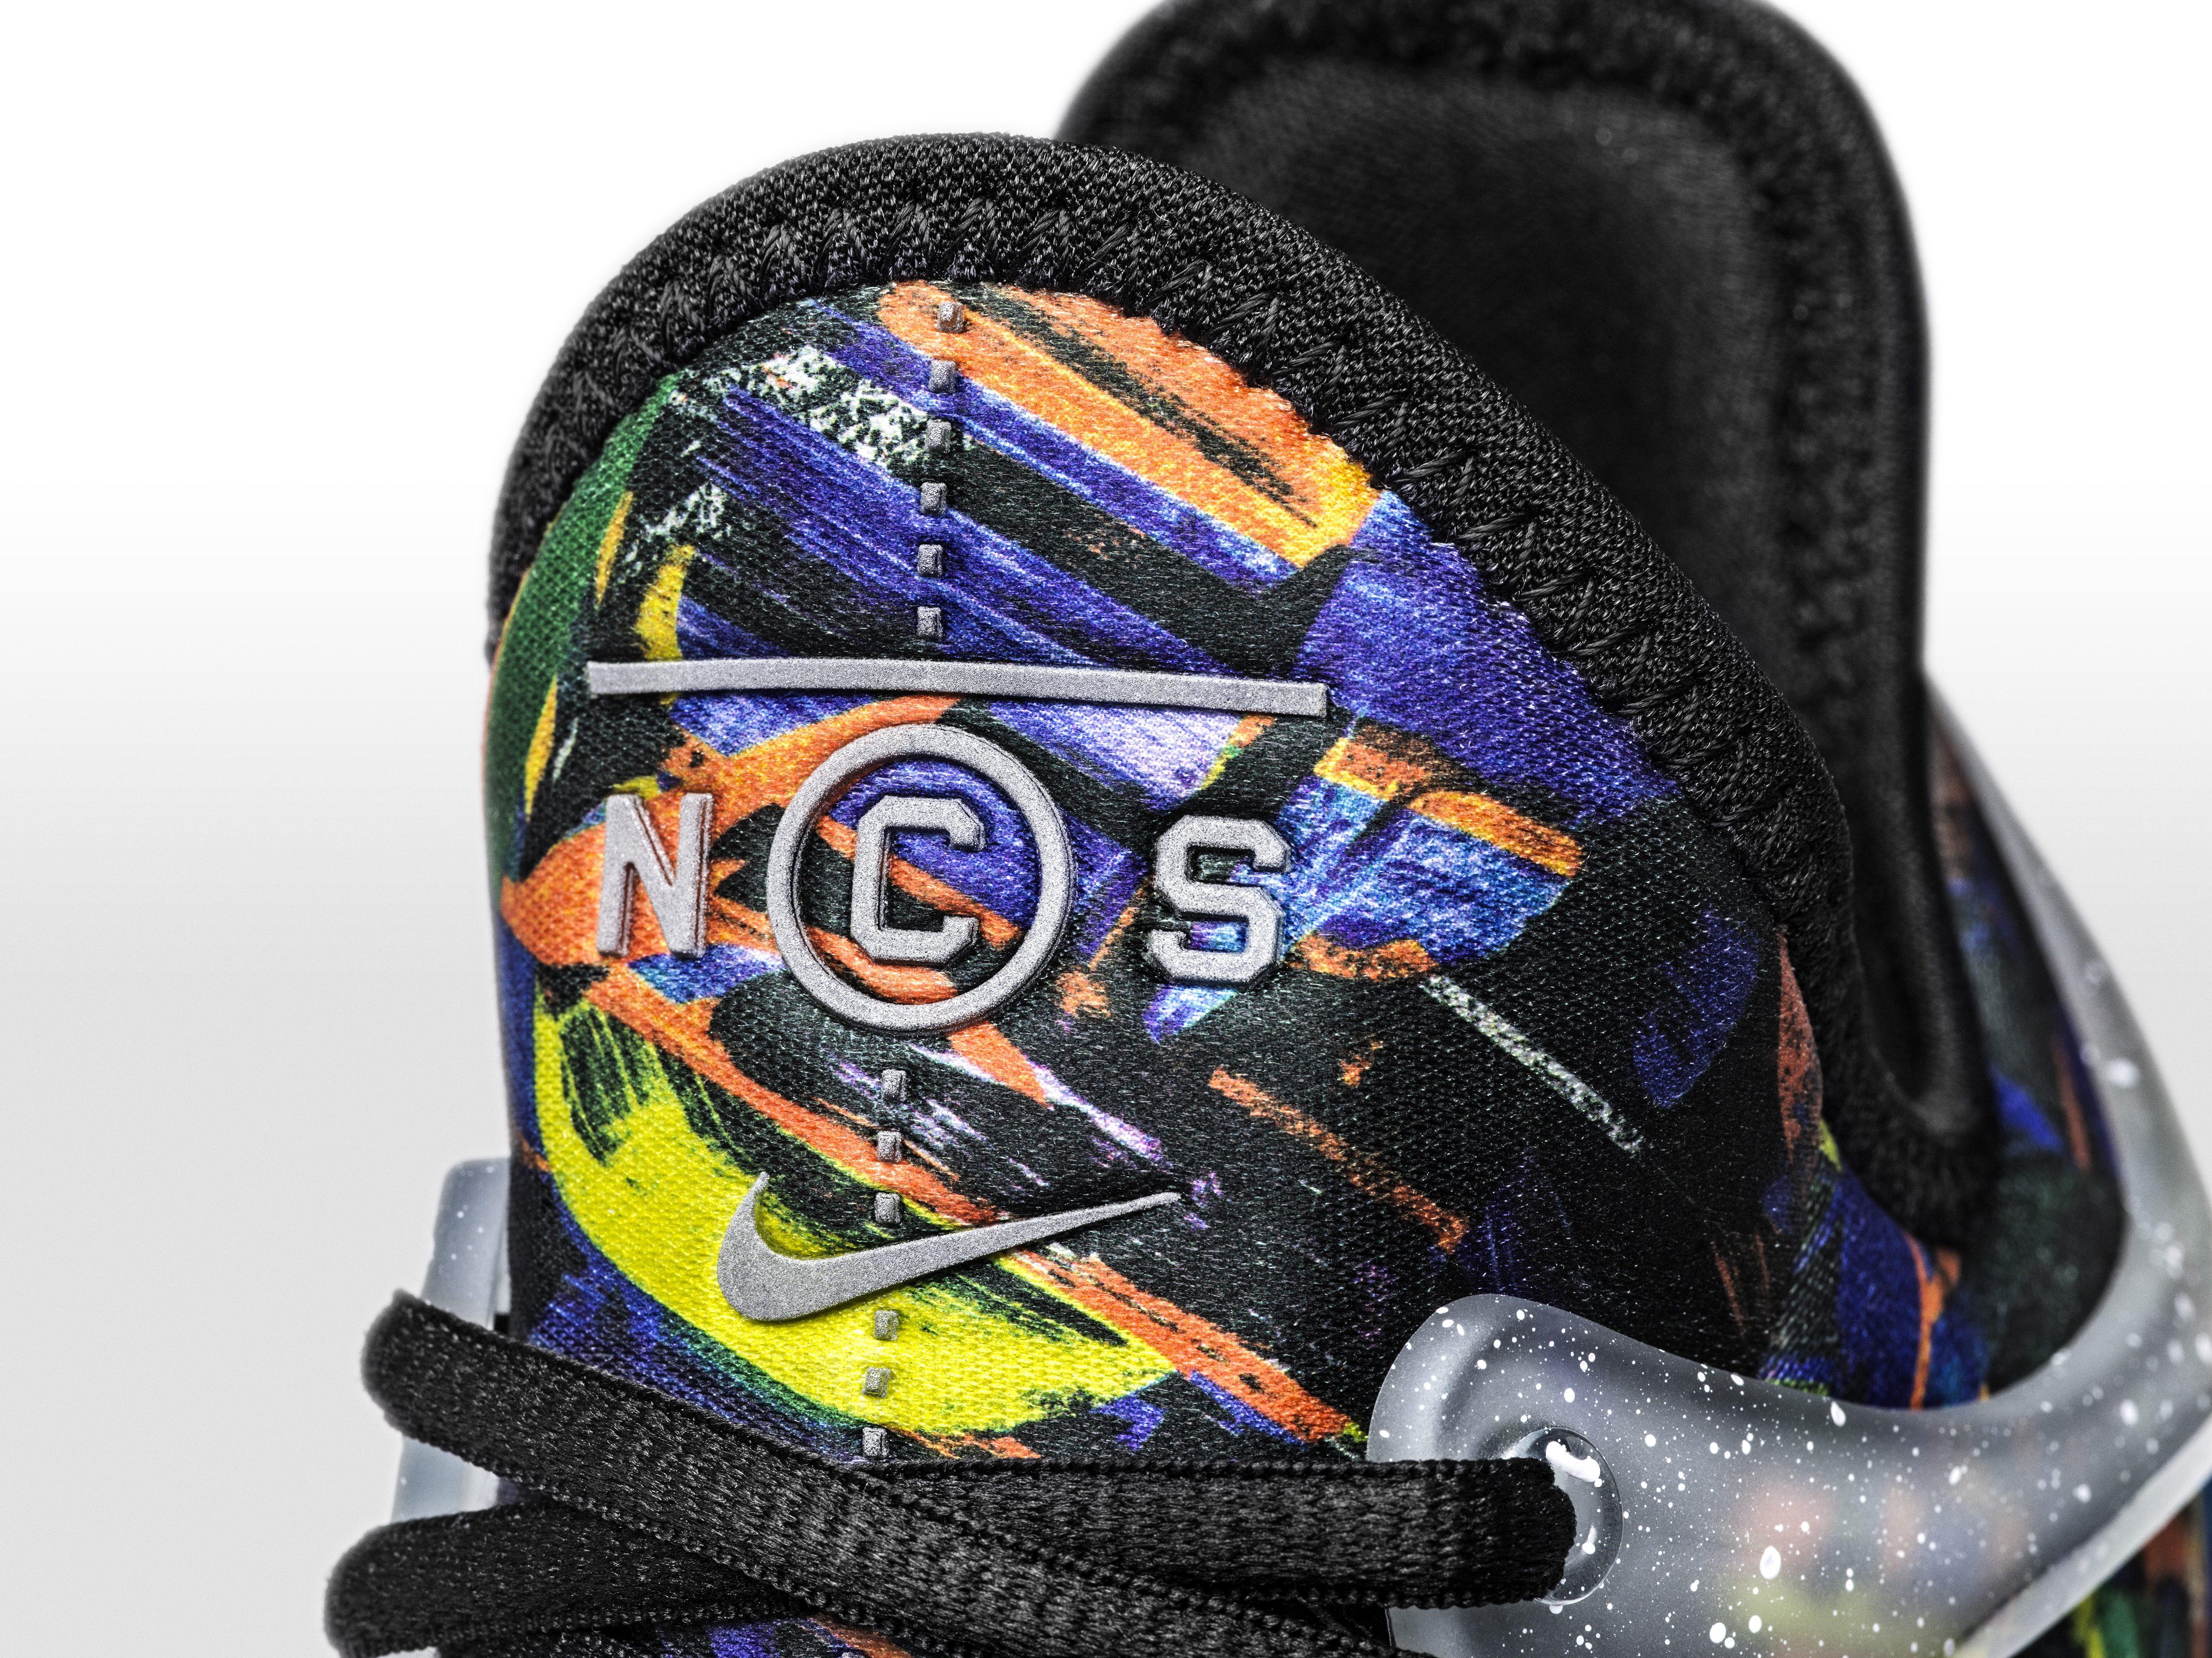 Nike_Net_Collectors_Society_HYPERREV_DET_02_39426